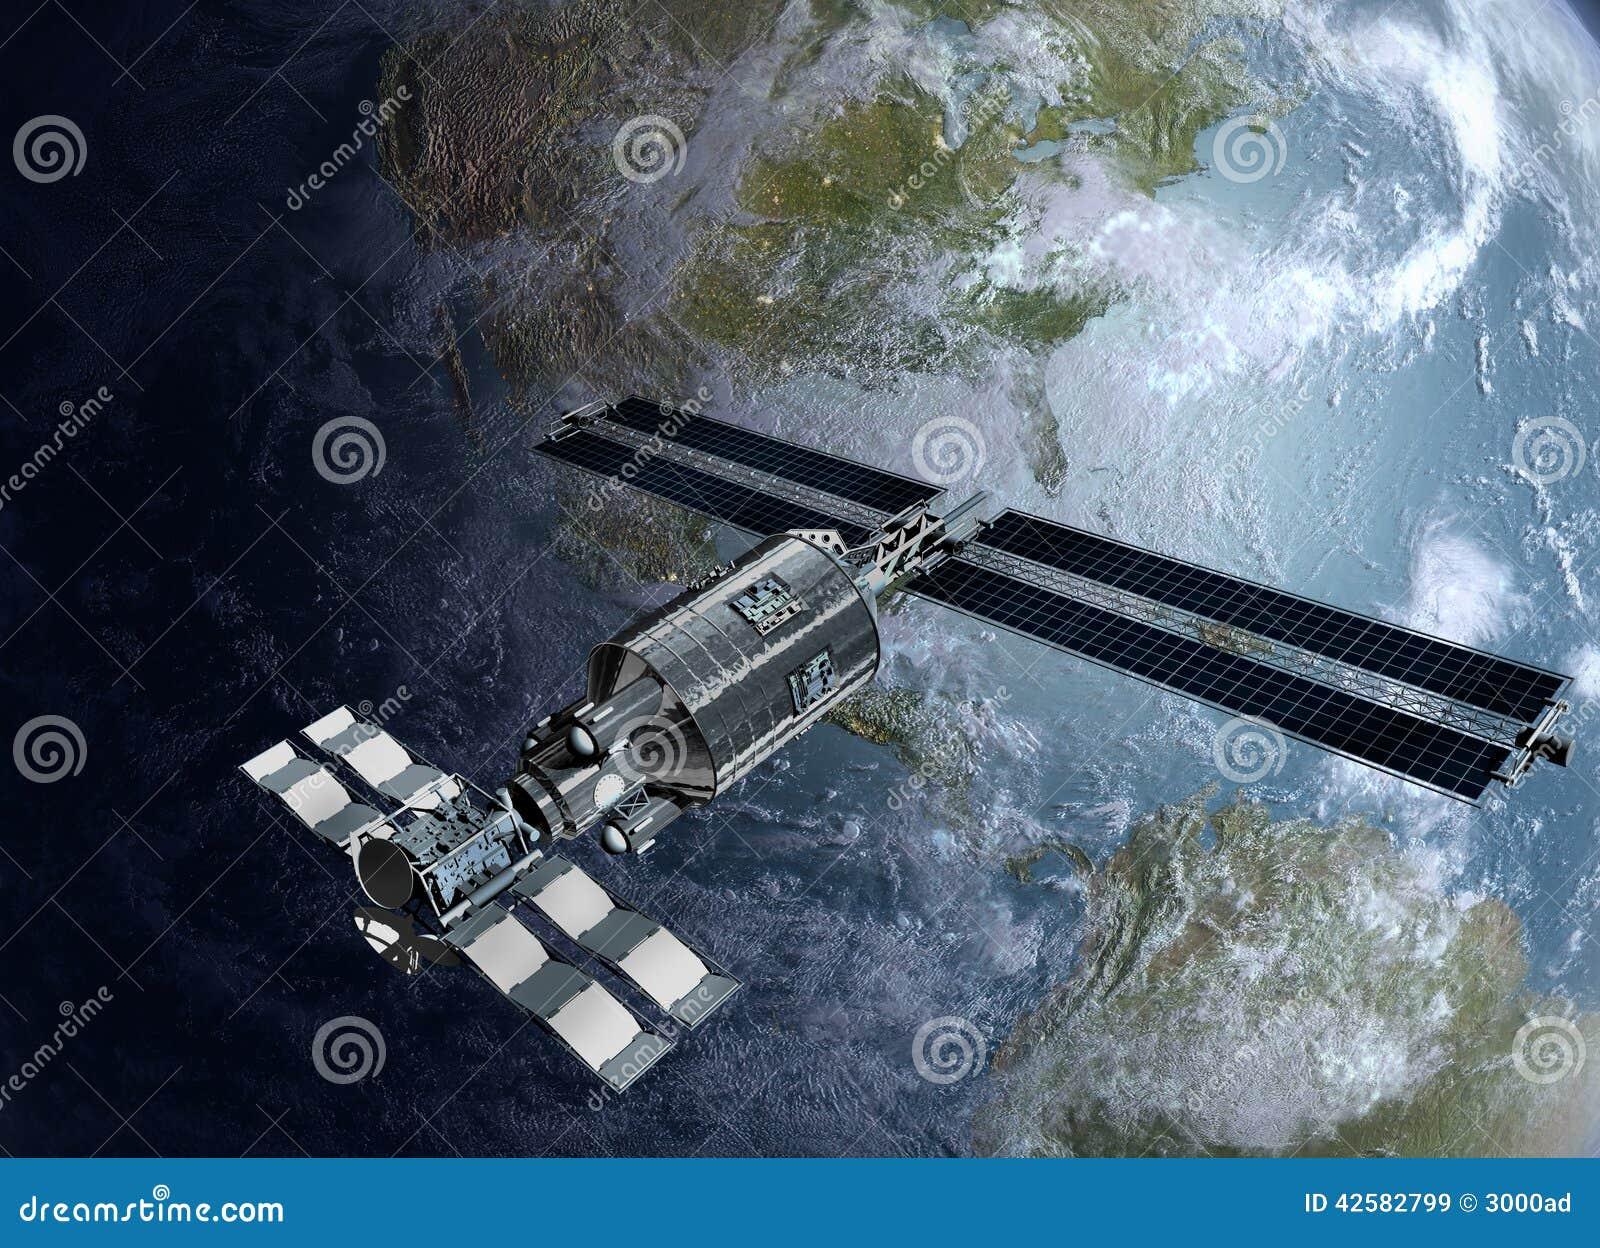 Satellite Spacelab Or Spacecraft Design For Sci F Stock